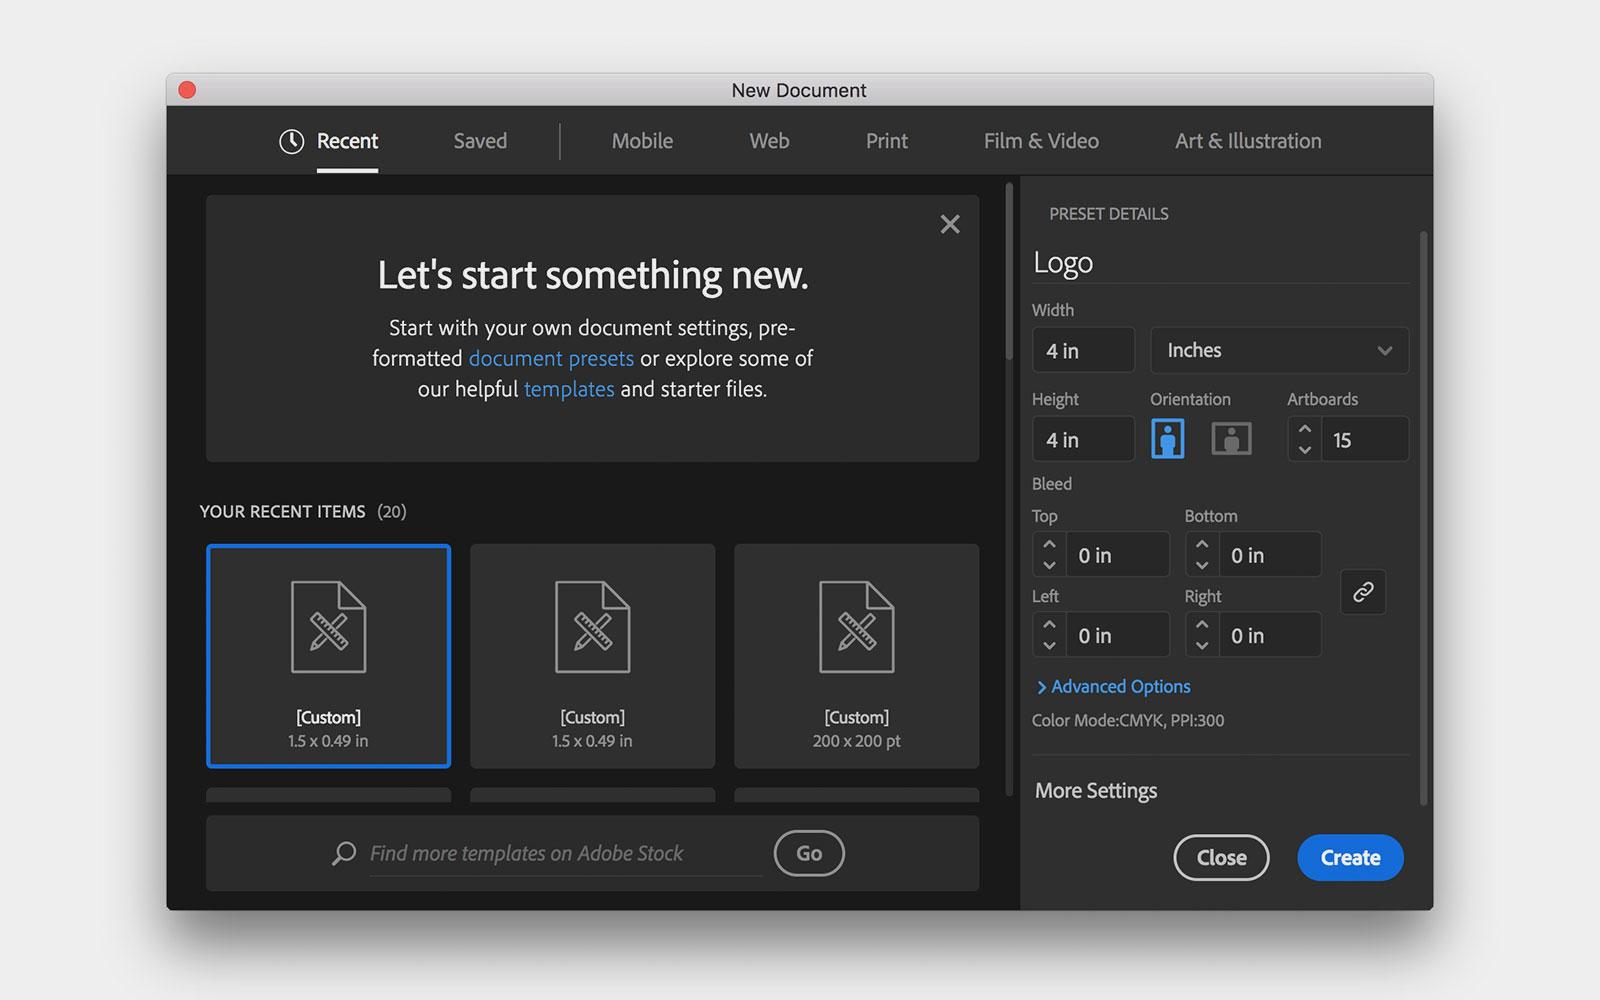 New document window in Illustrator